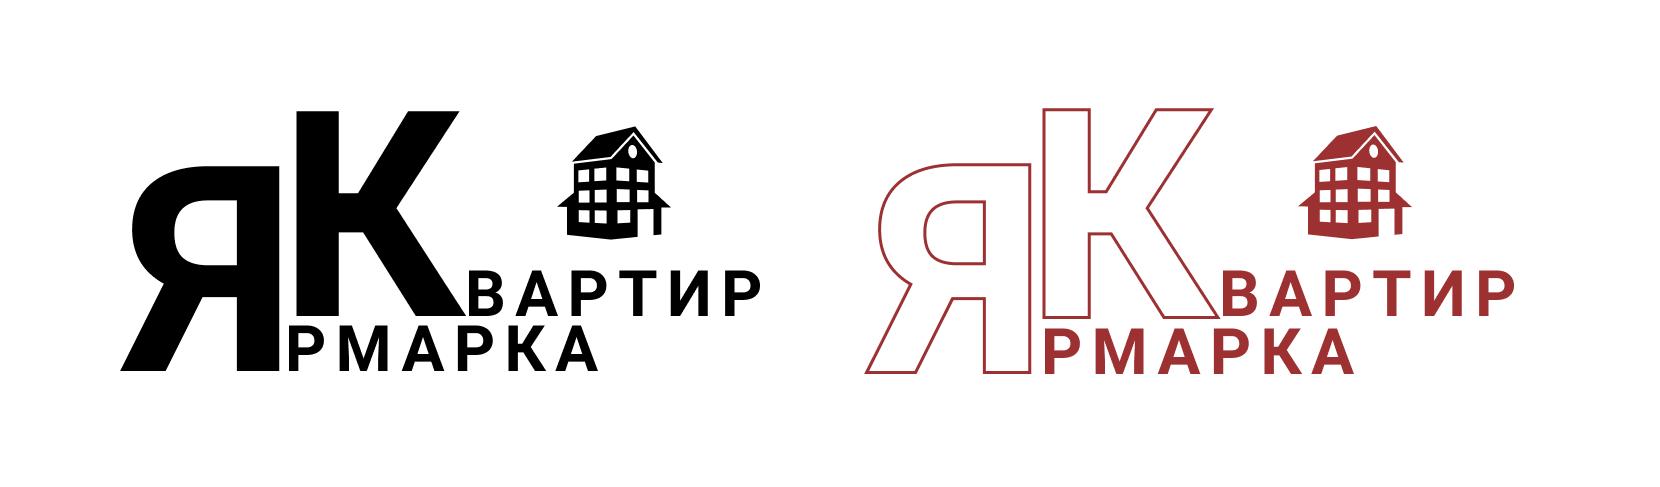 Создание логотипа, с вариантами для визитки и листовки фото f_730600557b6b046c.png